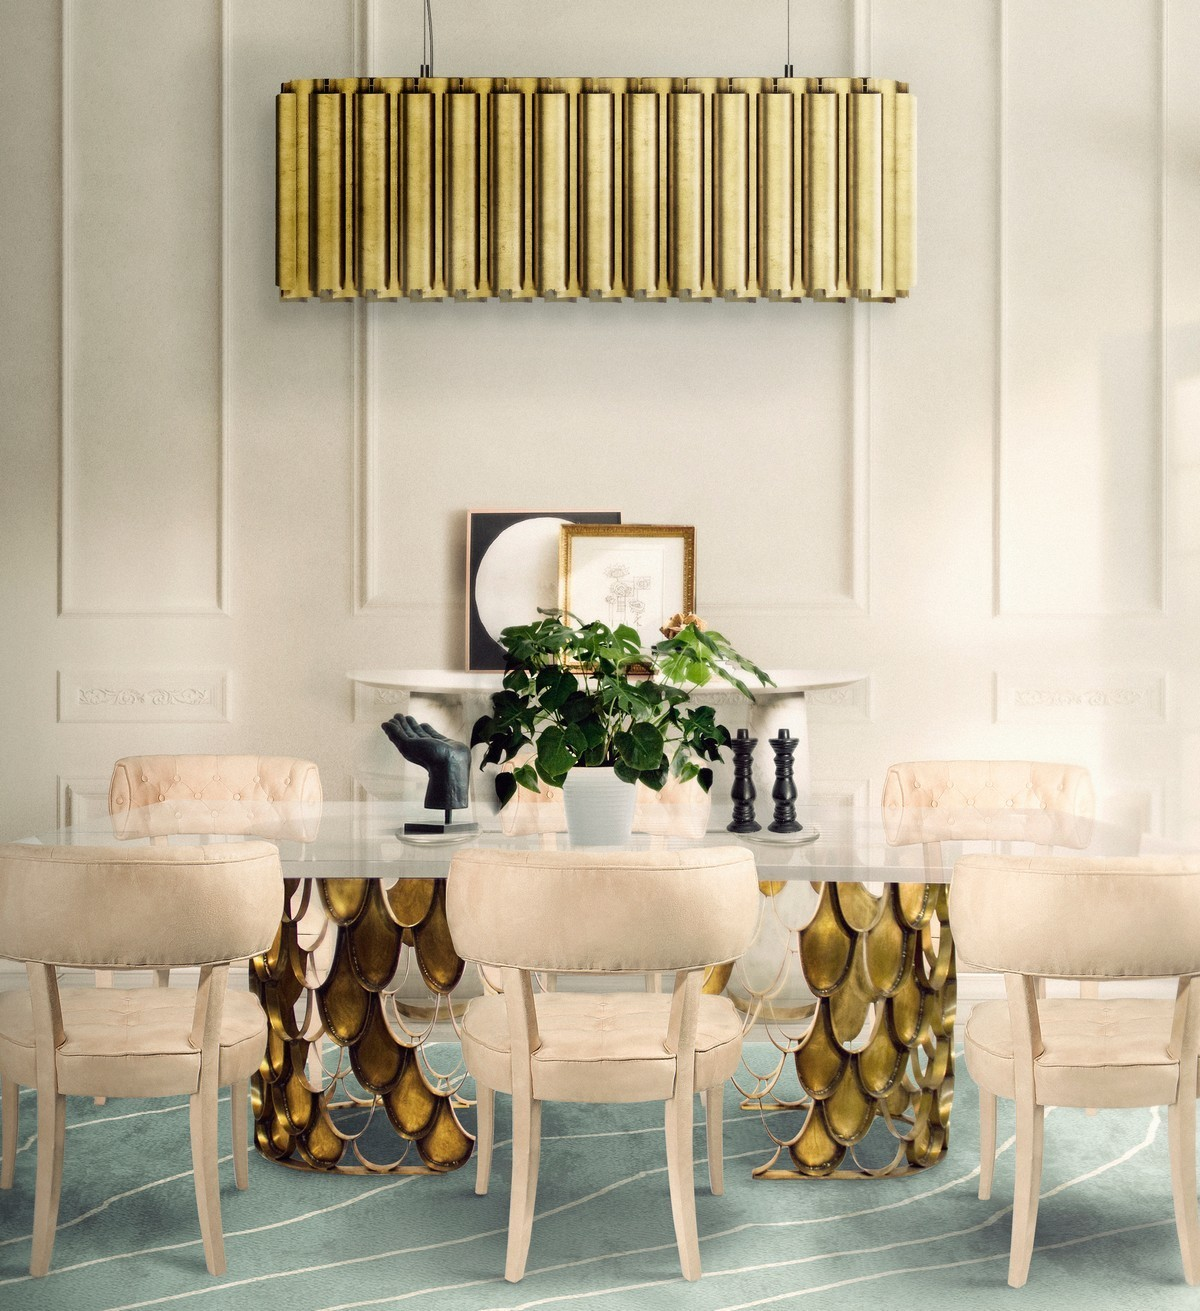 Top Minimalist Dining Chairs minimalist dining chairs Top Minimalist Dining Chairs zulu 2